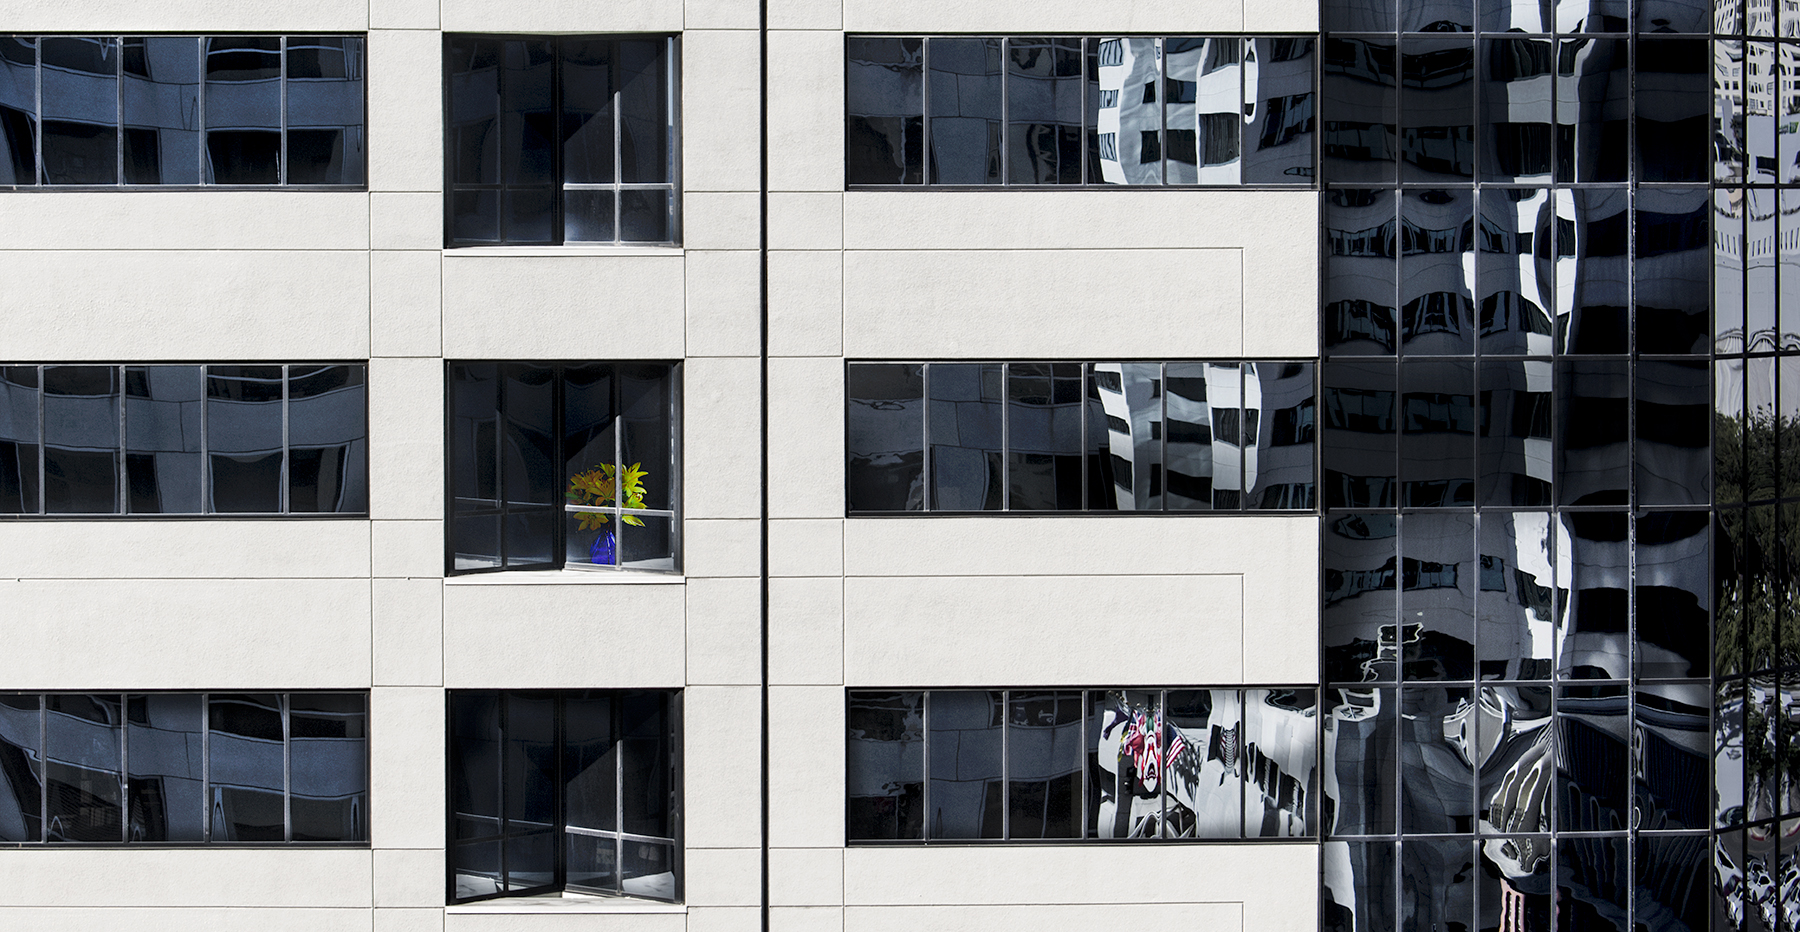 willa_davis_city-in-glass-03.jpg